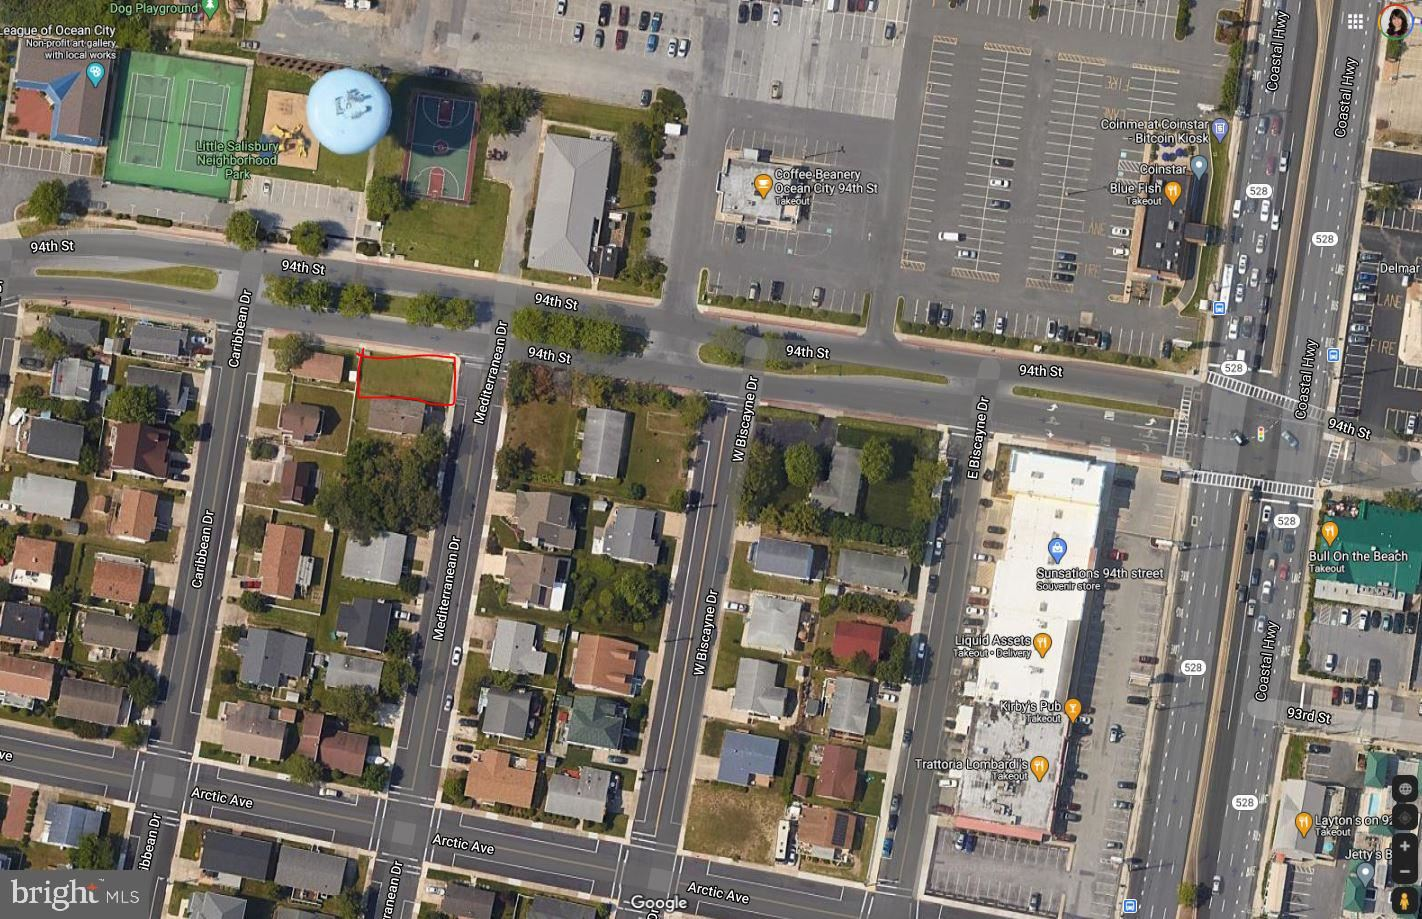 Photo of 0 94TH ST, OCEAN CITY, MD 21842 (MLS # MDWO117704)